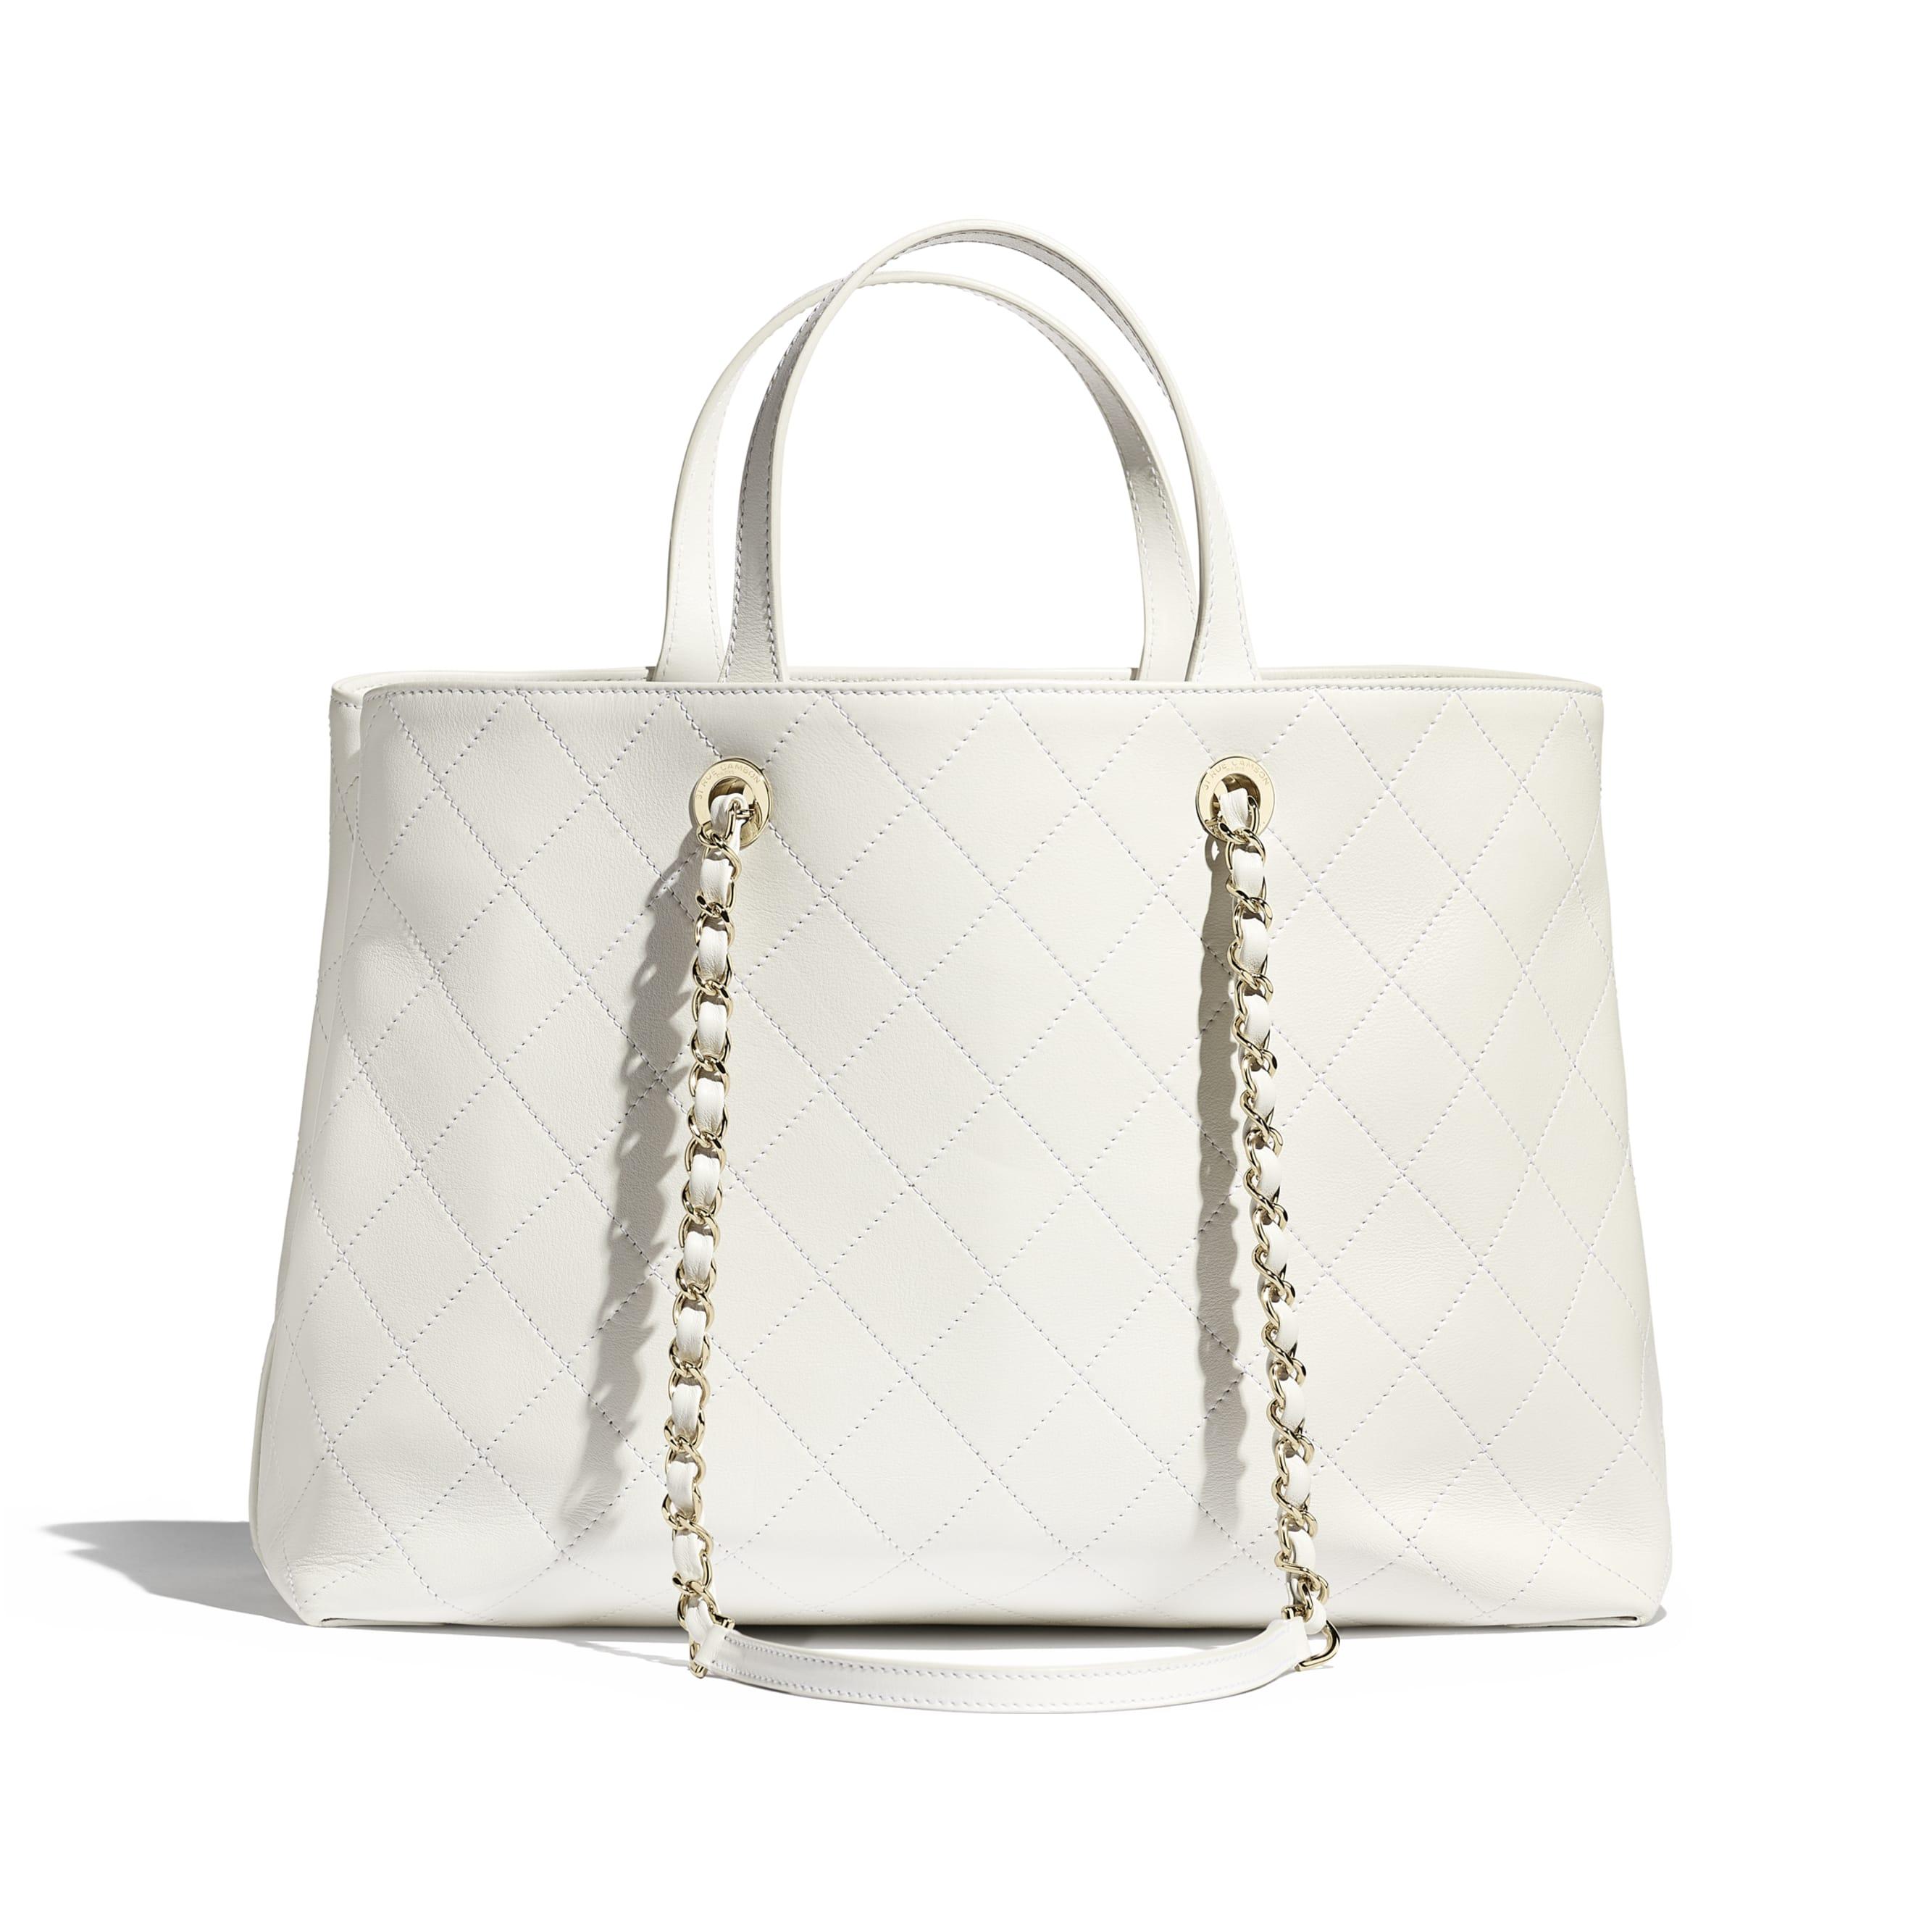 Shopping Bag - White - Calfskin & Gold-Tone Metal - CHANEL - Alternative view - see standard sized version